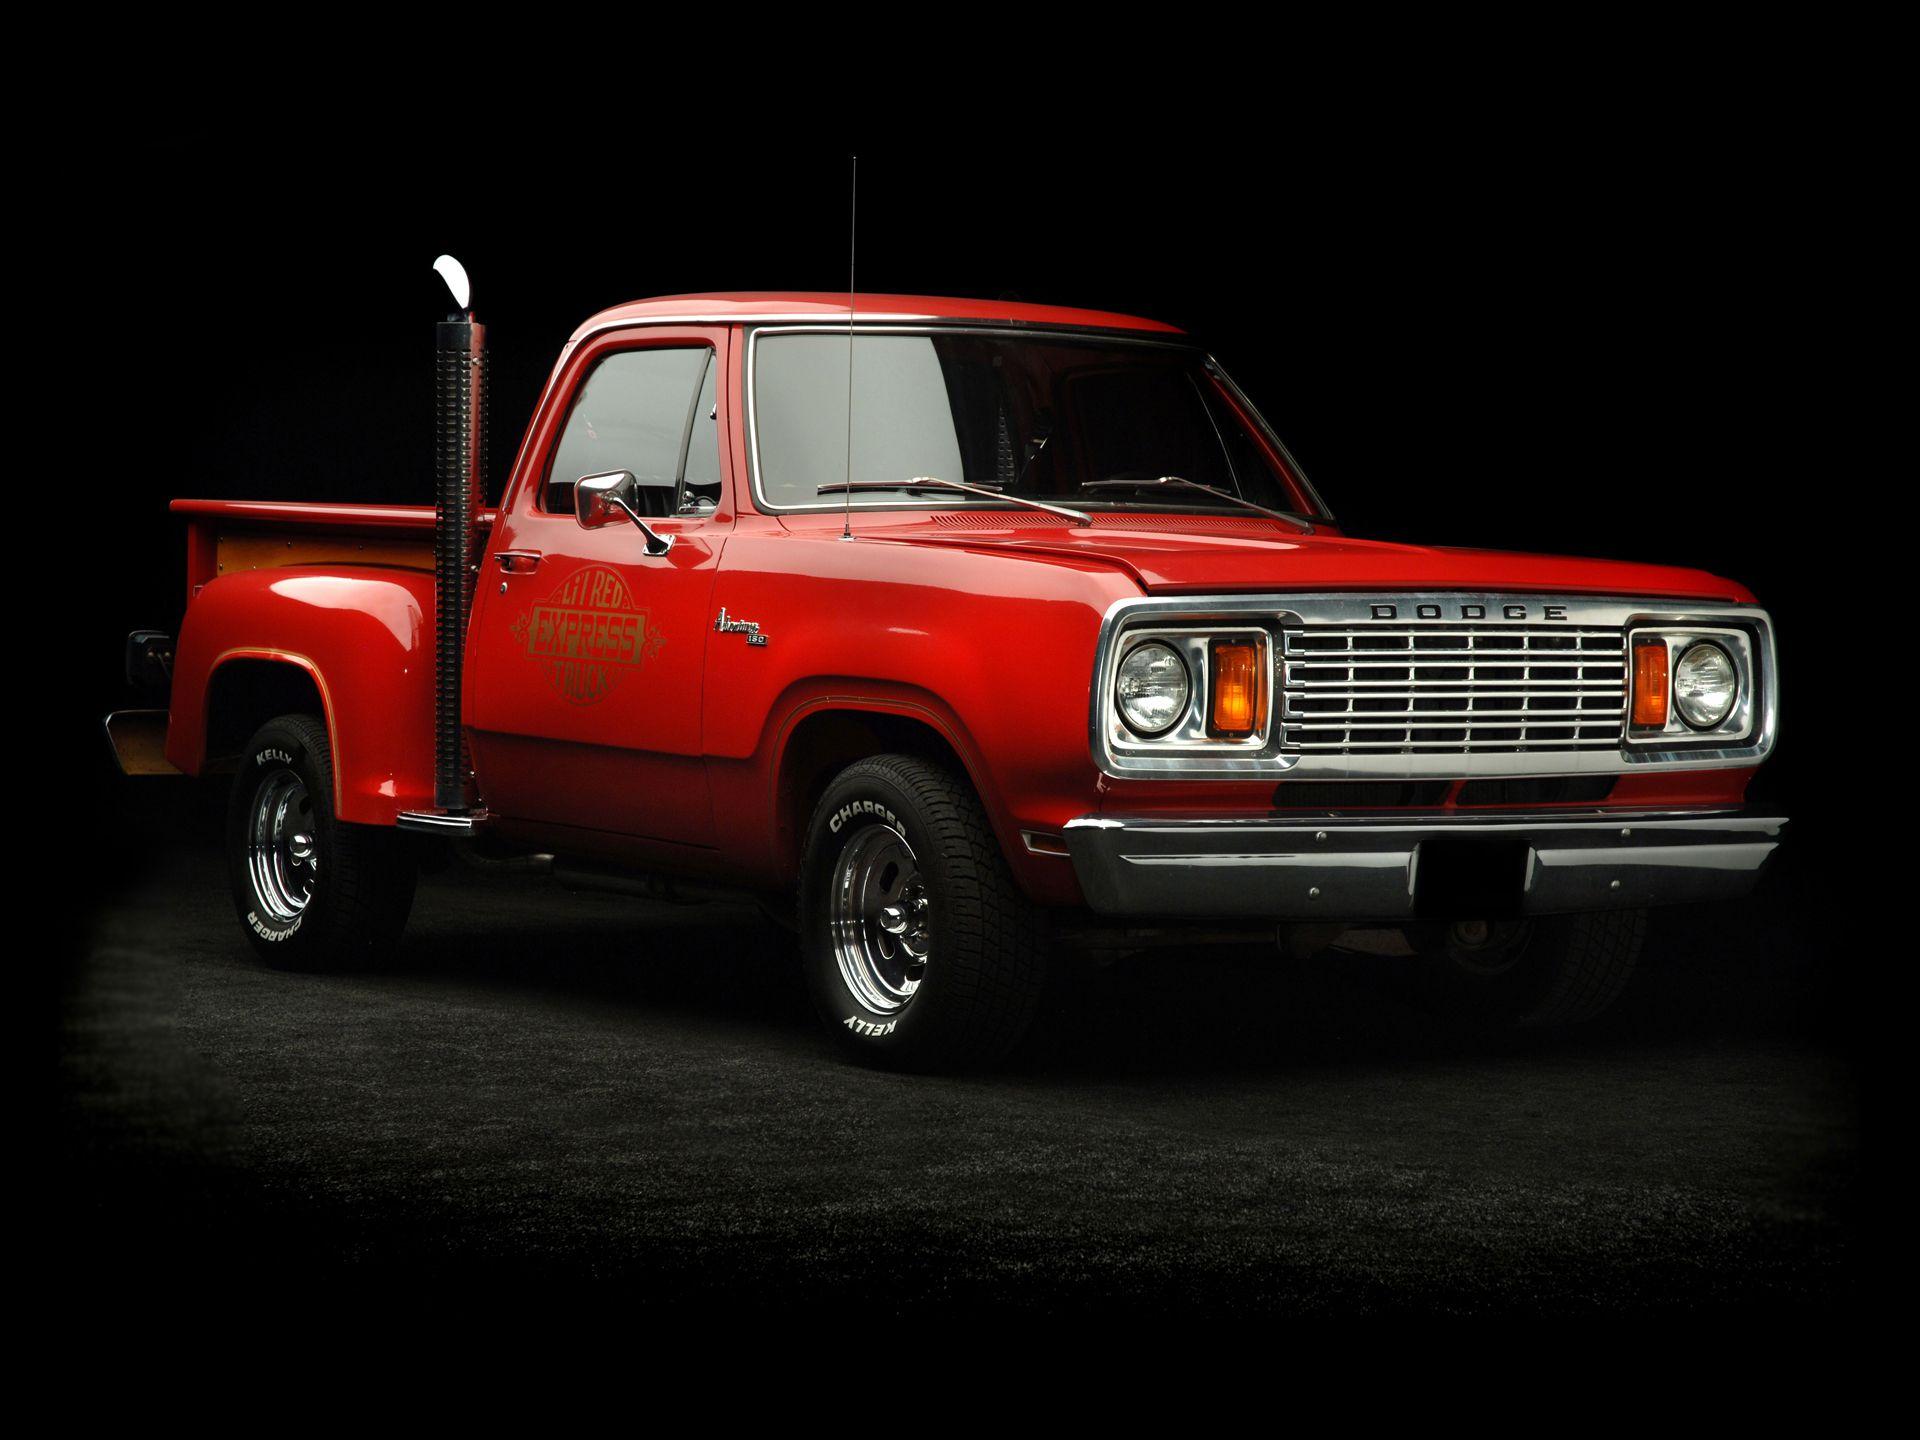 Dodge adventurer li l red express truck one really cool truck